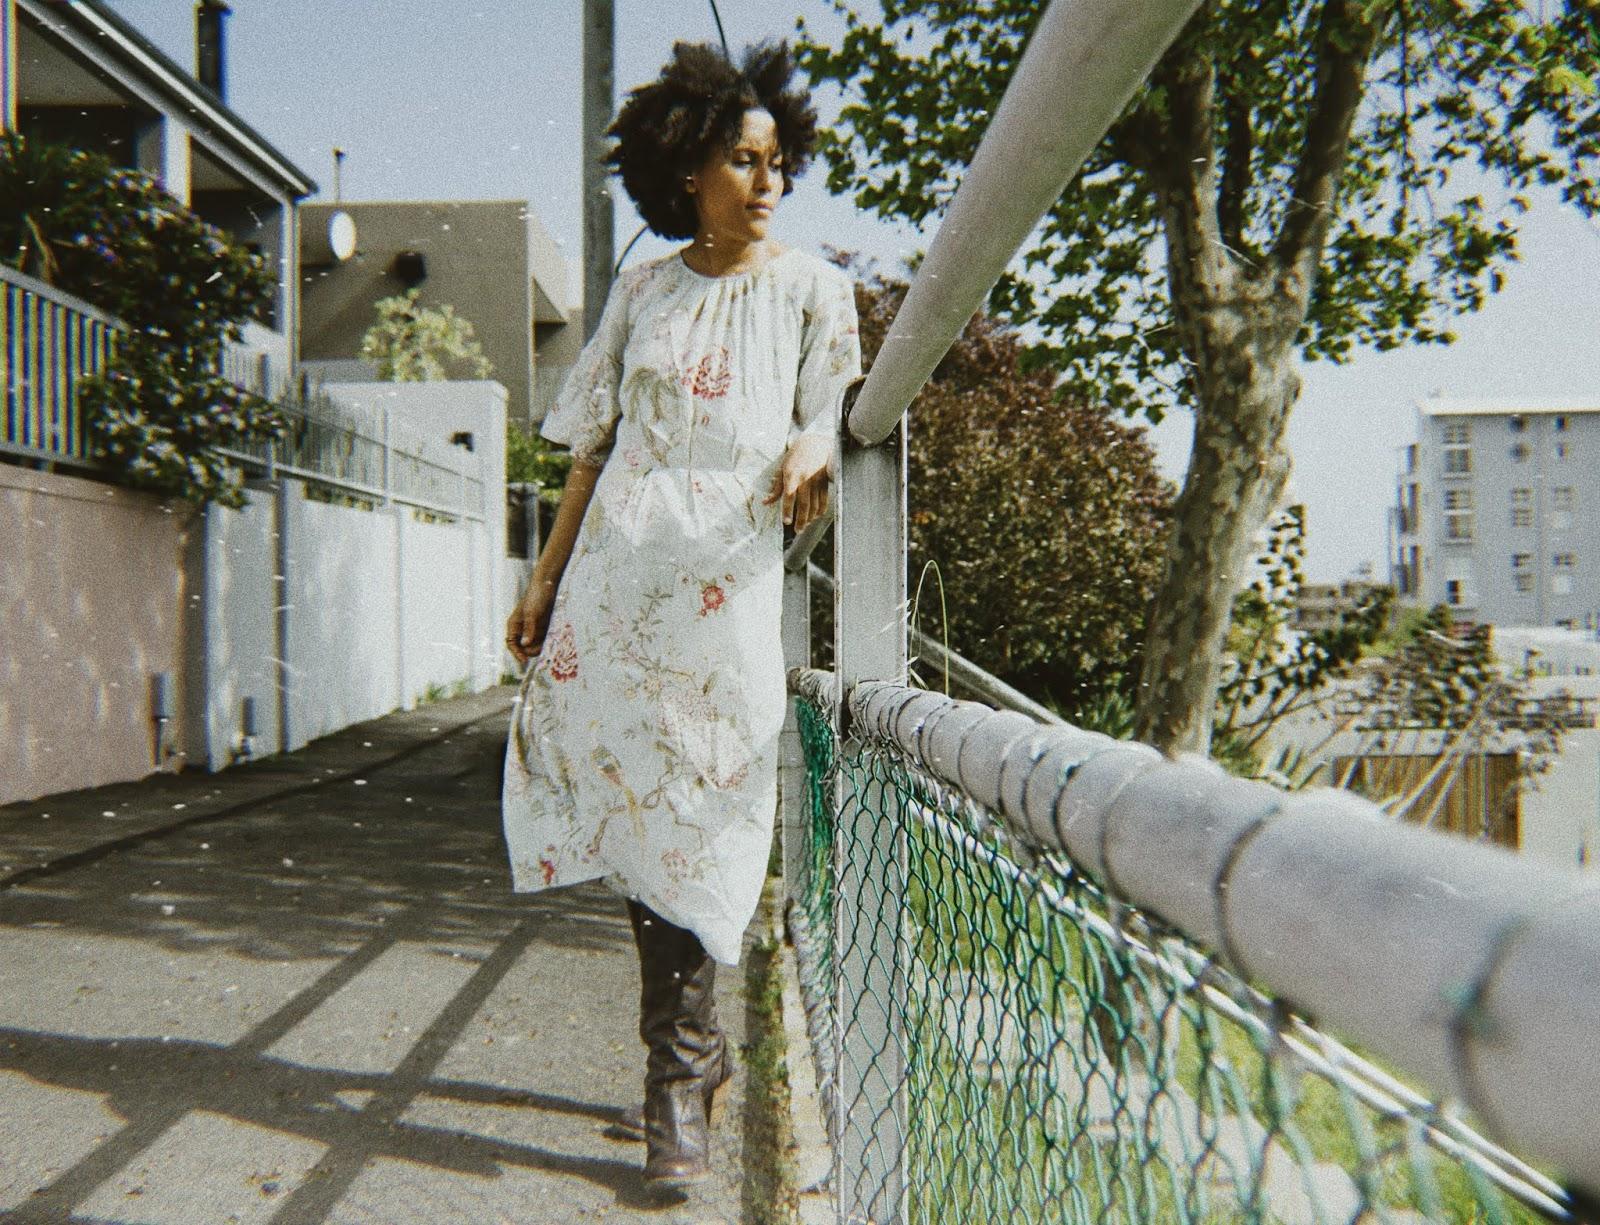 Liezel-Esquire-patterned-dress